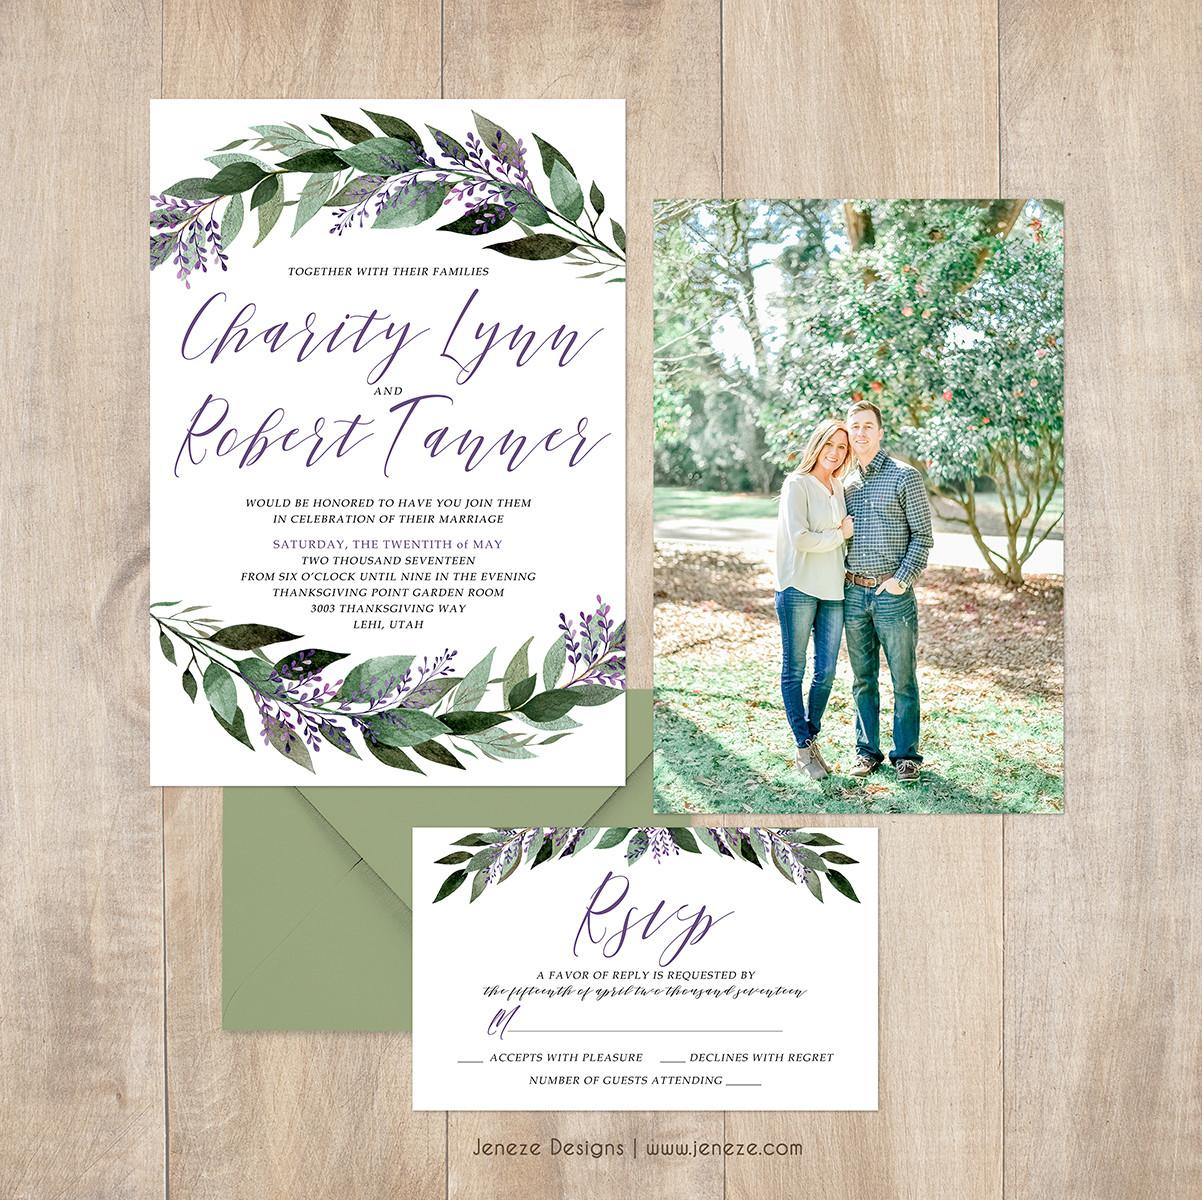 Invitation - Item#CA301 | Jeneze Designs Custom Wedding Invitations